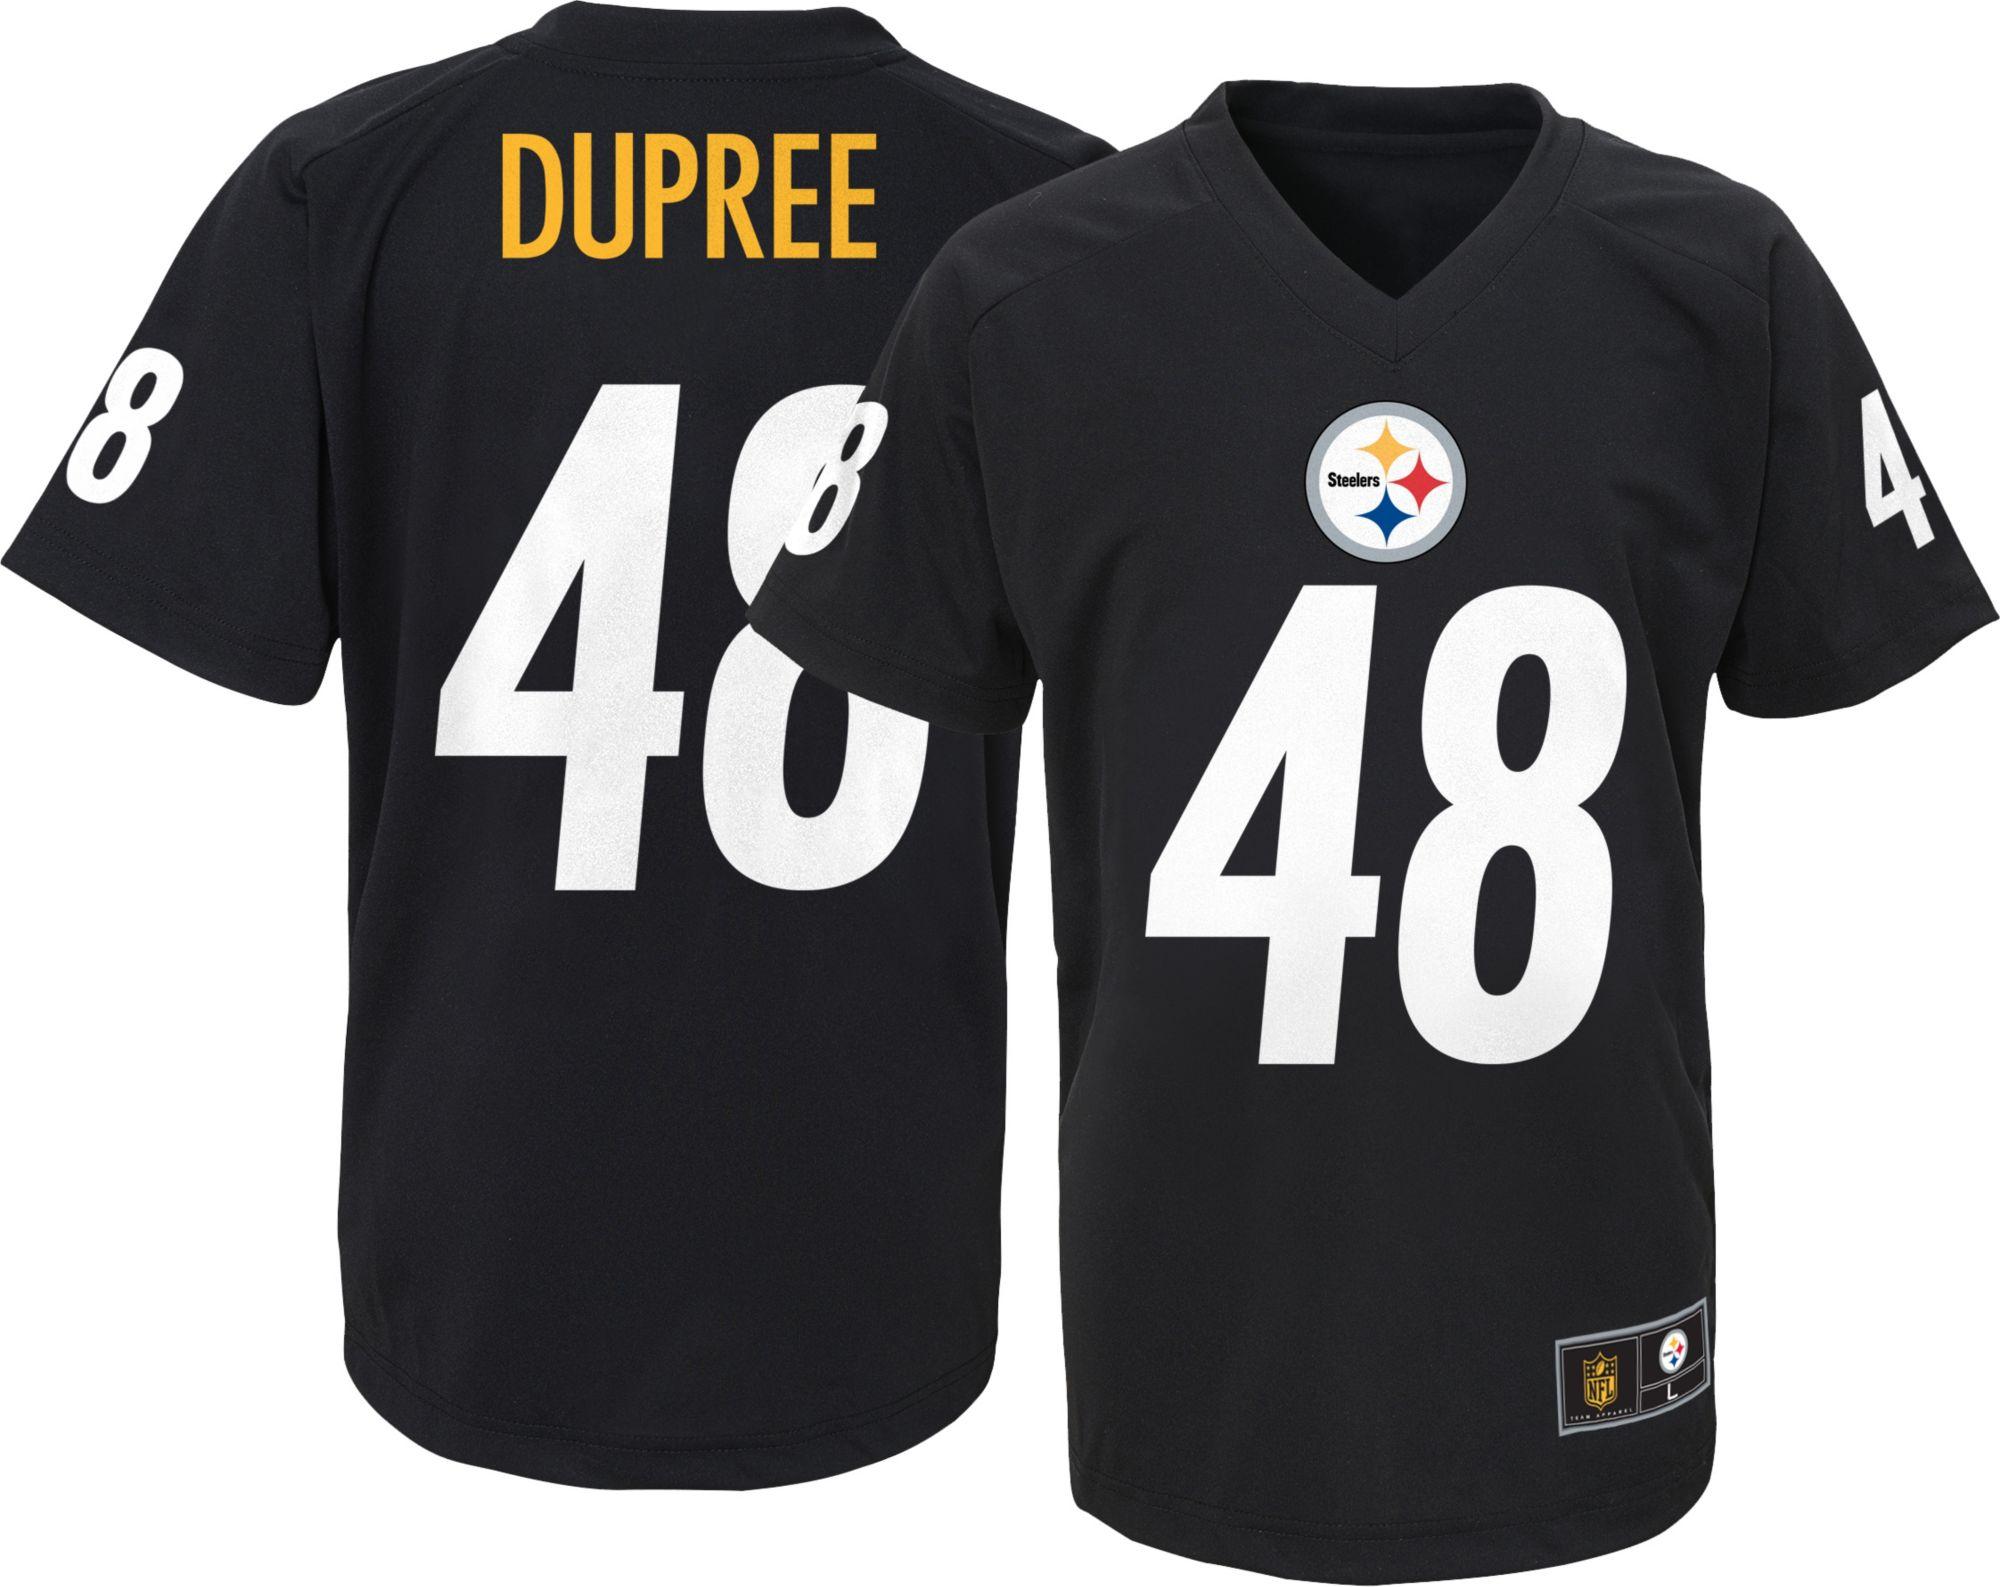 Bud Dupree NFL Jersey